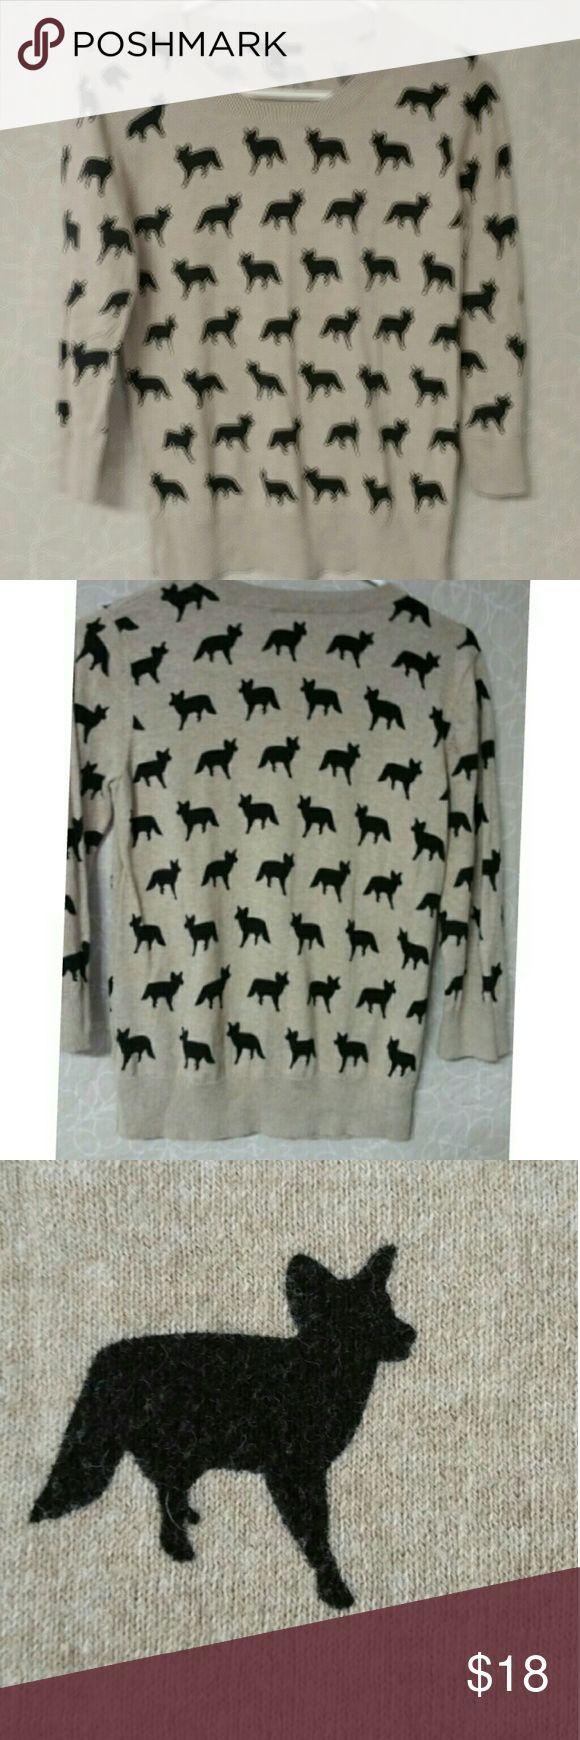 Forever 21 3/4 sleeve light weight sweater Cute Forever 21 sweater, light weight, with 3/4 sleeve, fox print Sweaters Crew & Scoop Necks